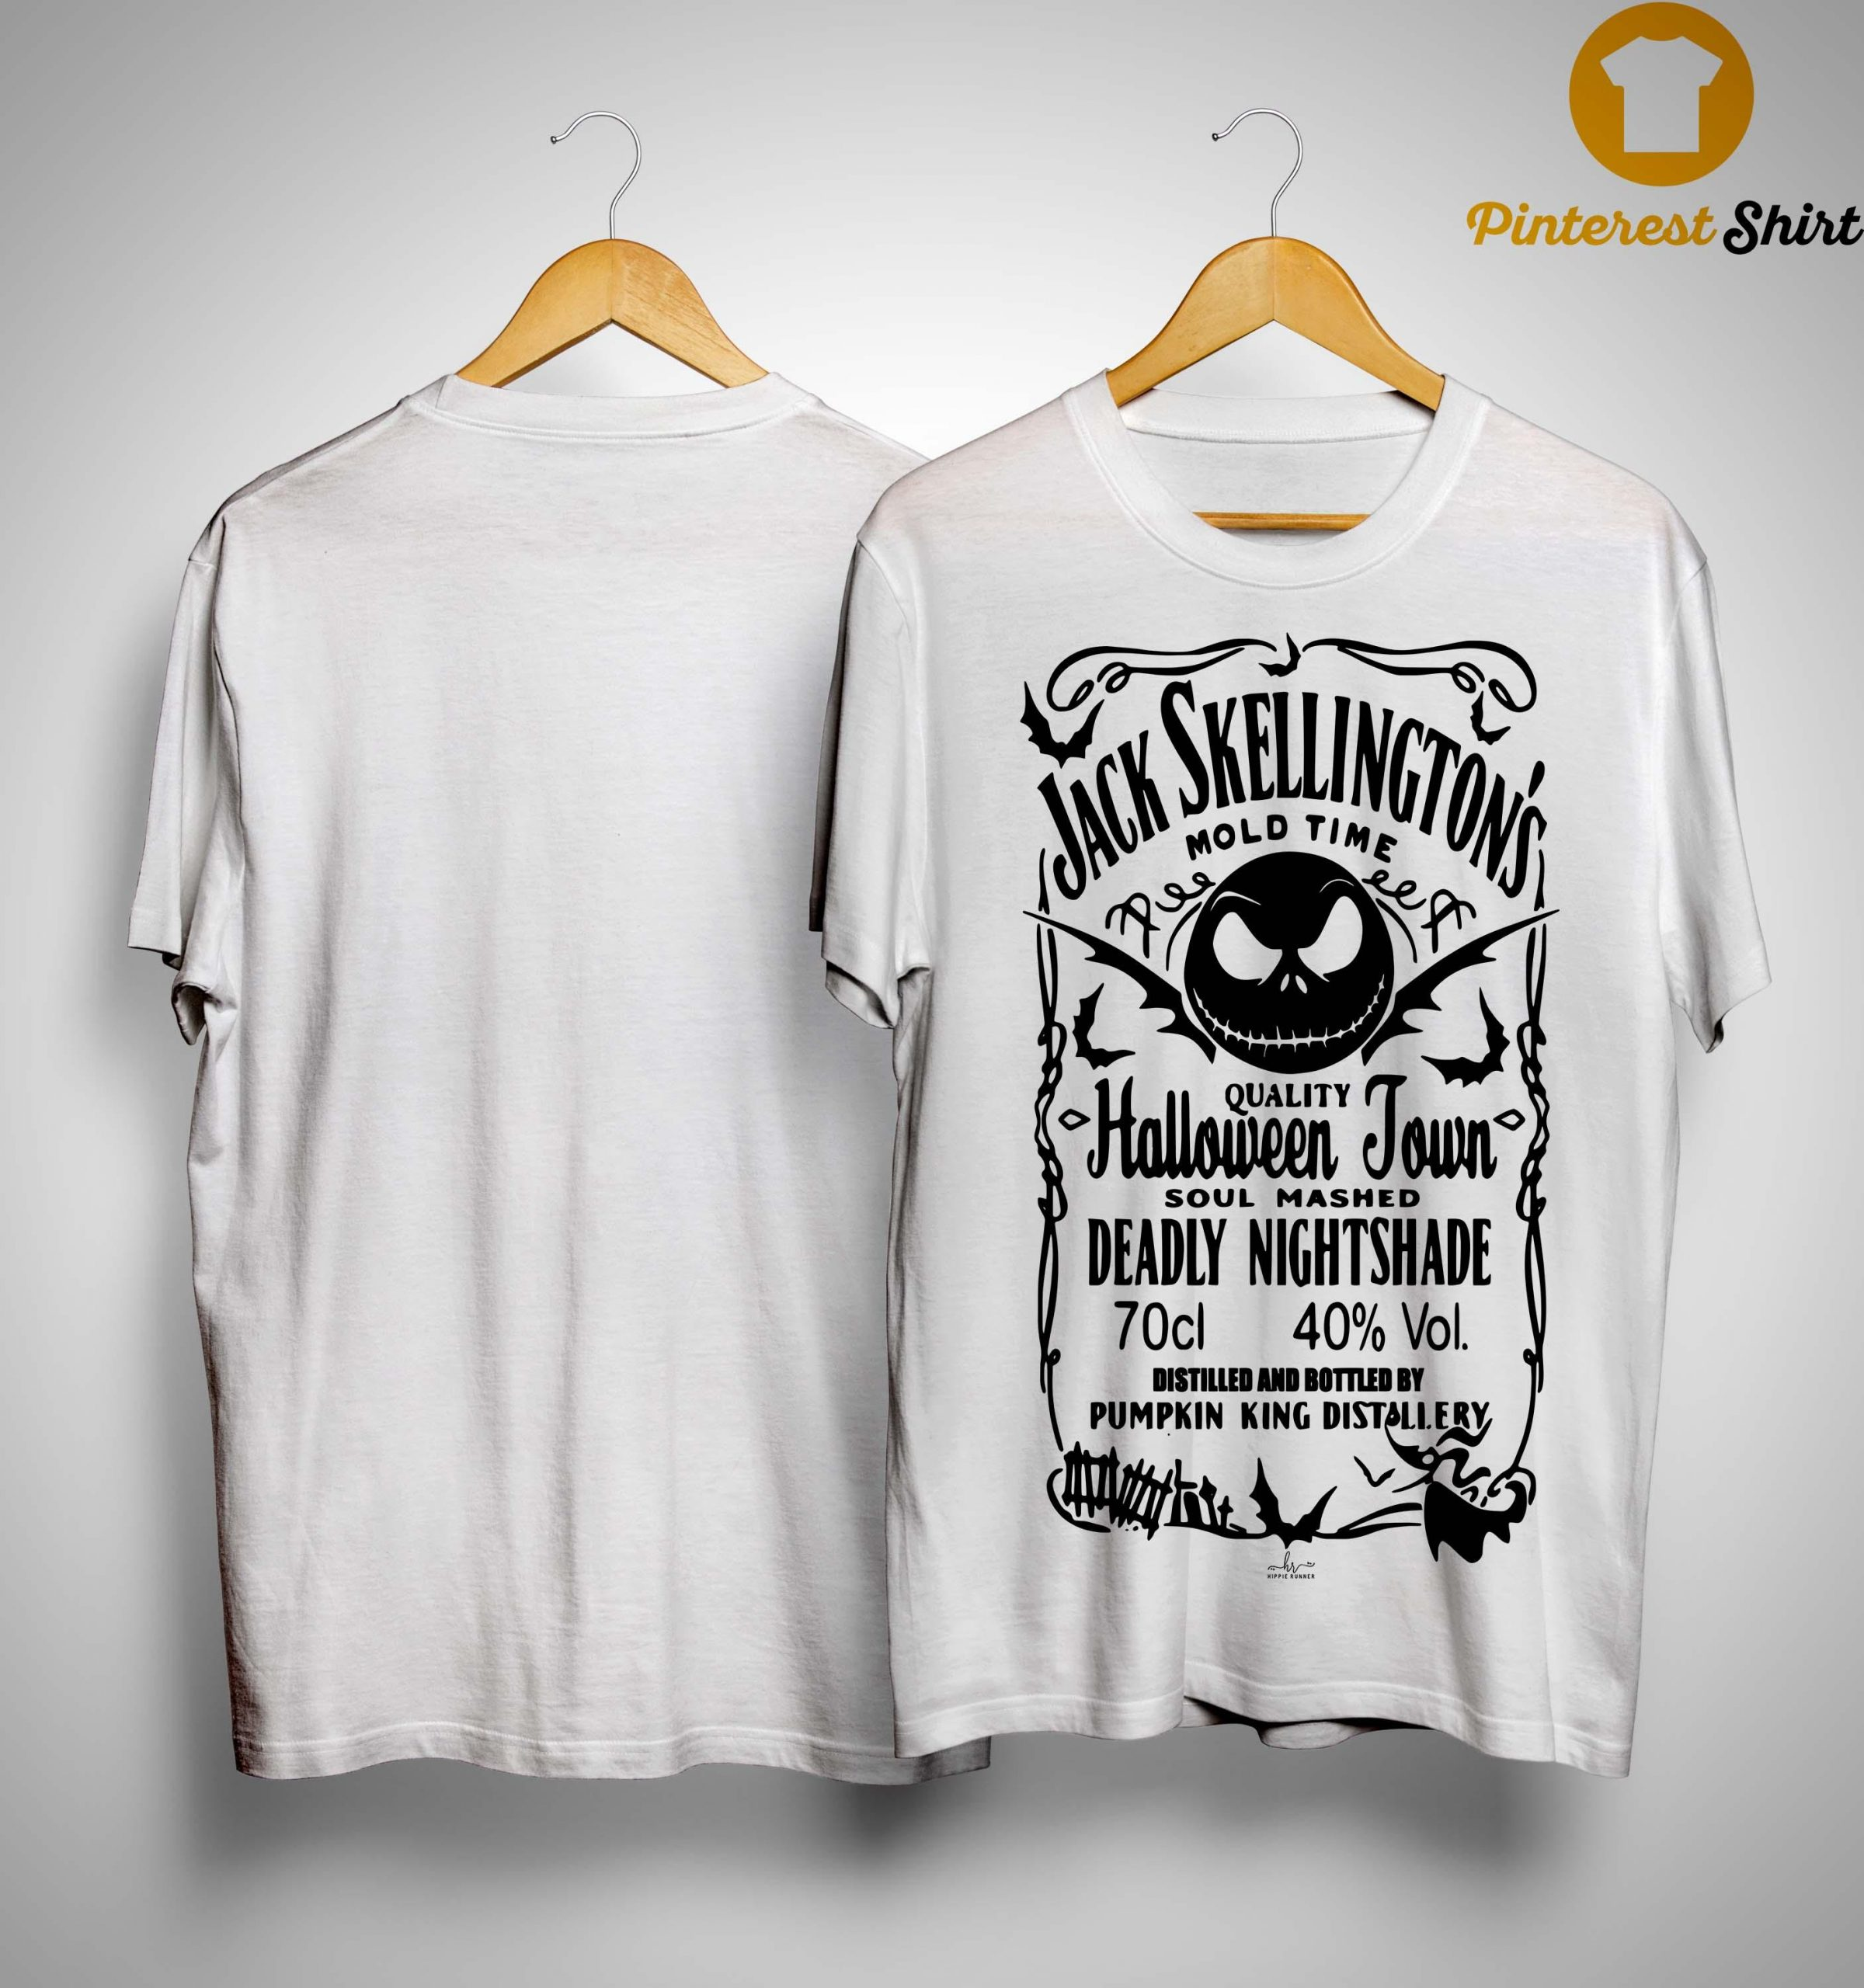 Jack Skellington Mold Time Quality Halloween Town Shirt